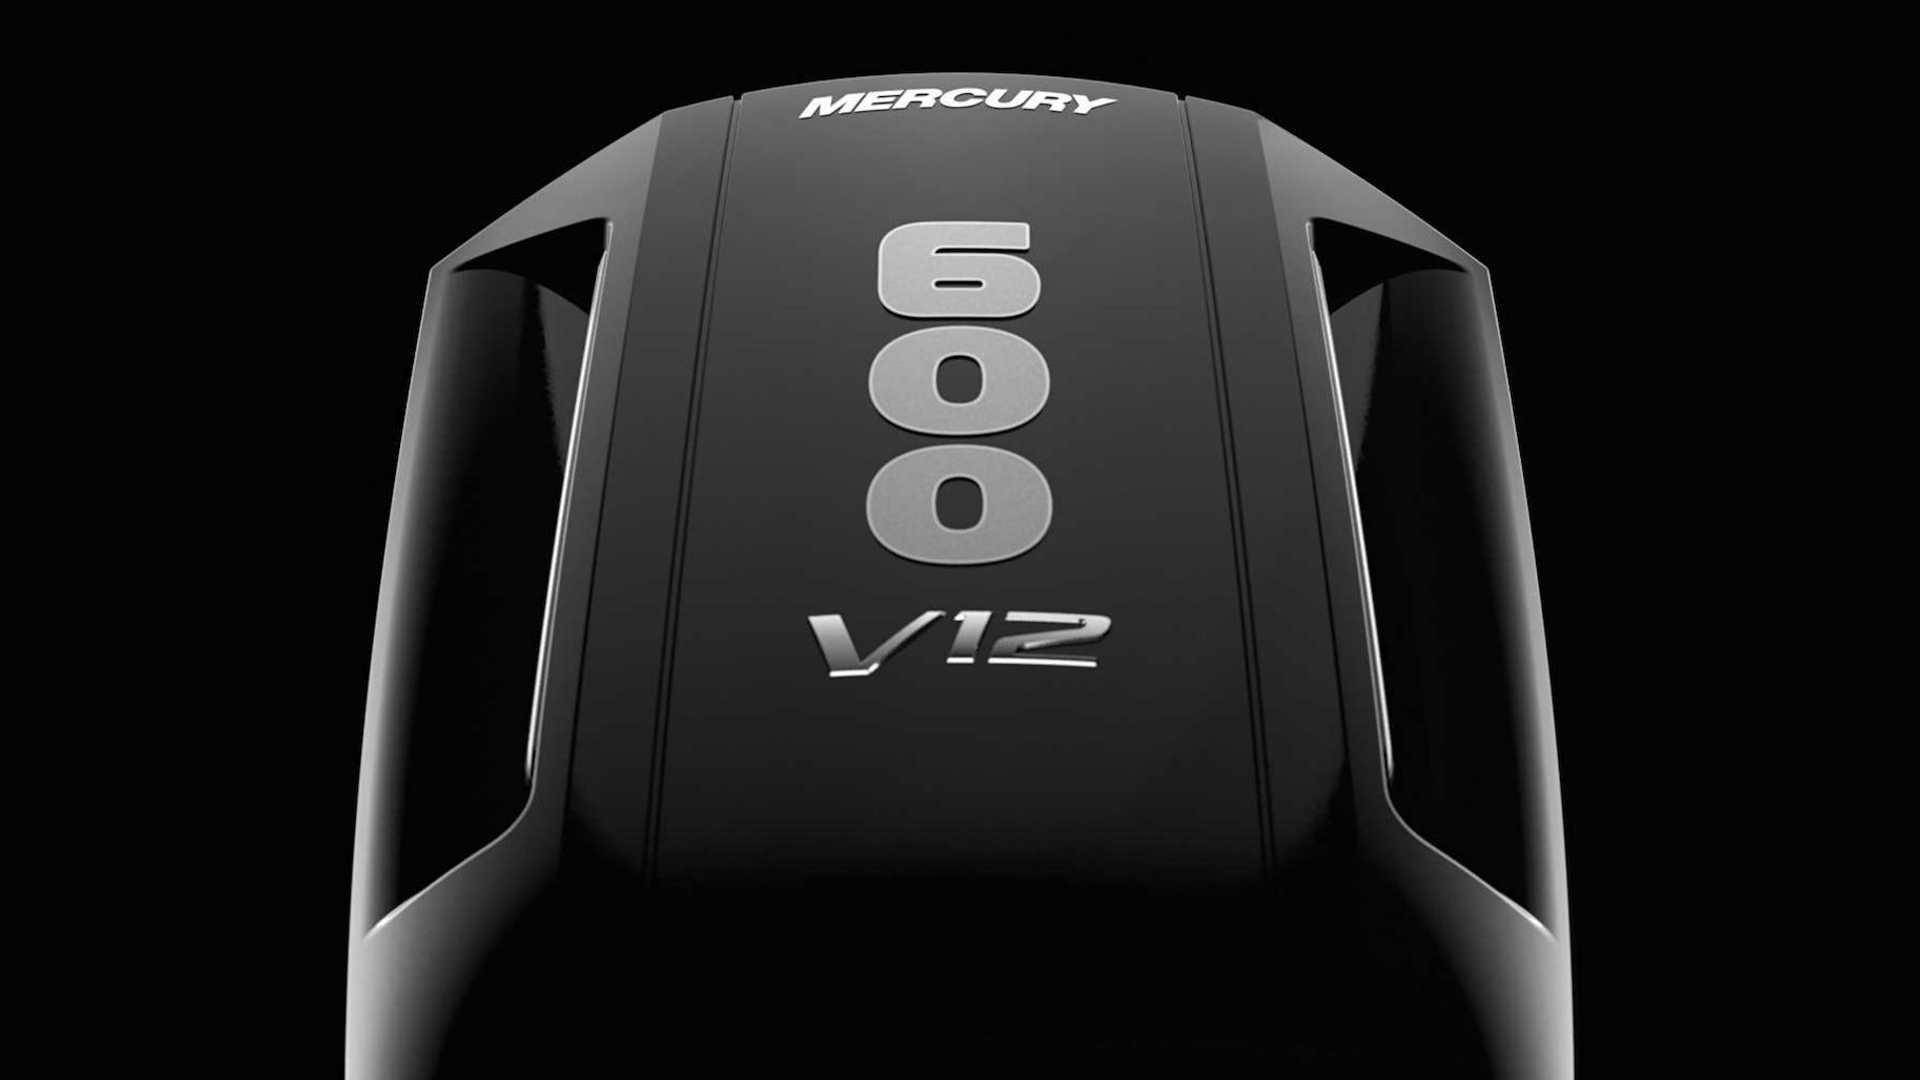 V12 VERADO